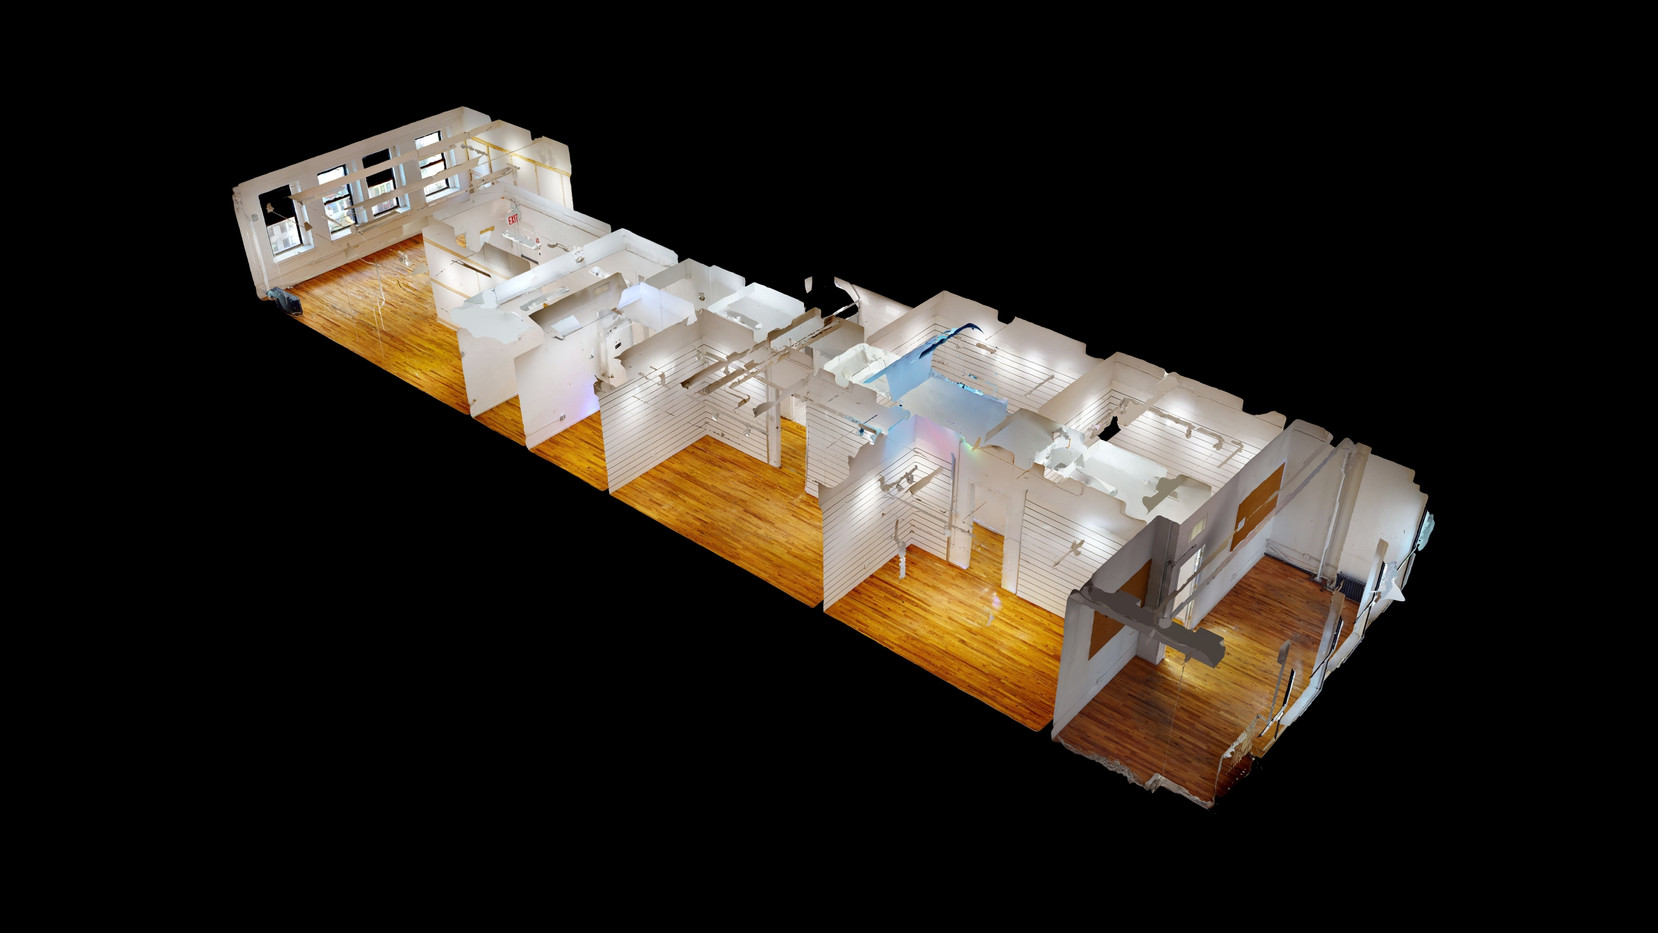 18-W-33rd-St-Dollhouse-View-scaled.jpg